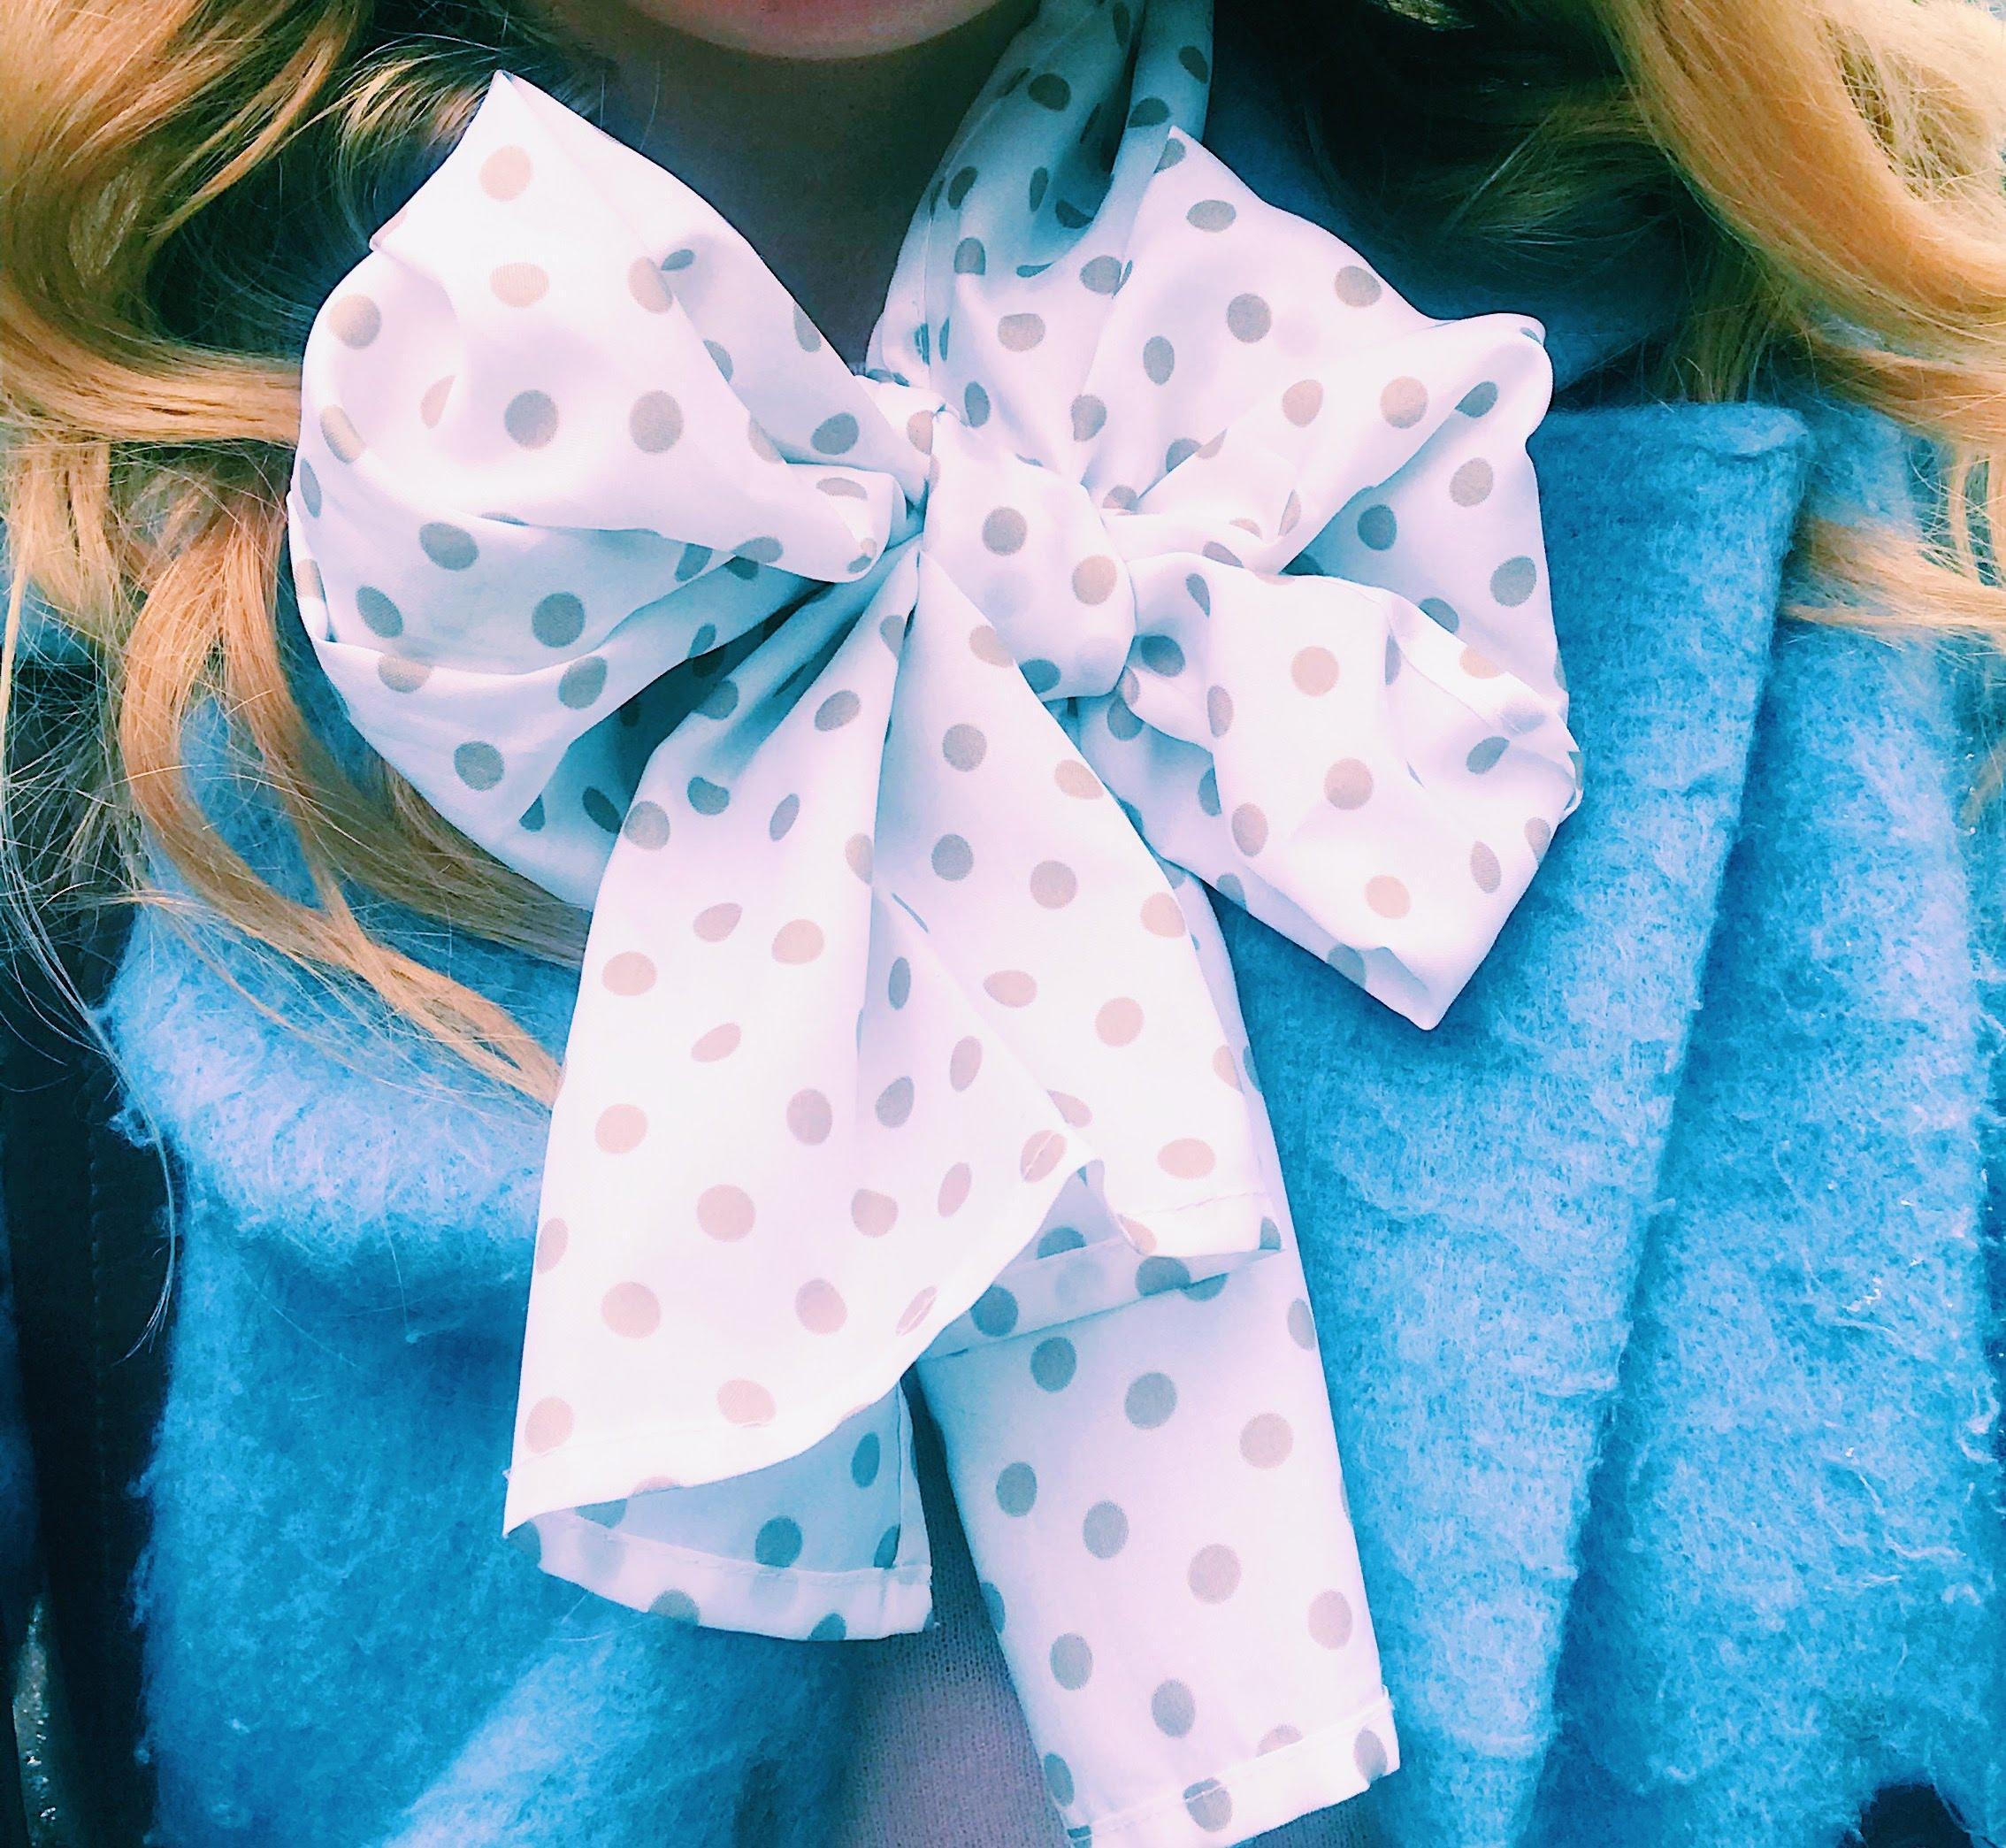 Three Heel Clicks - Pale Blue Coat and Polka Dot Scarf.jpg